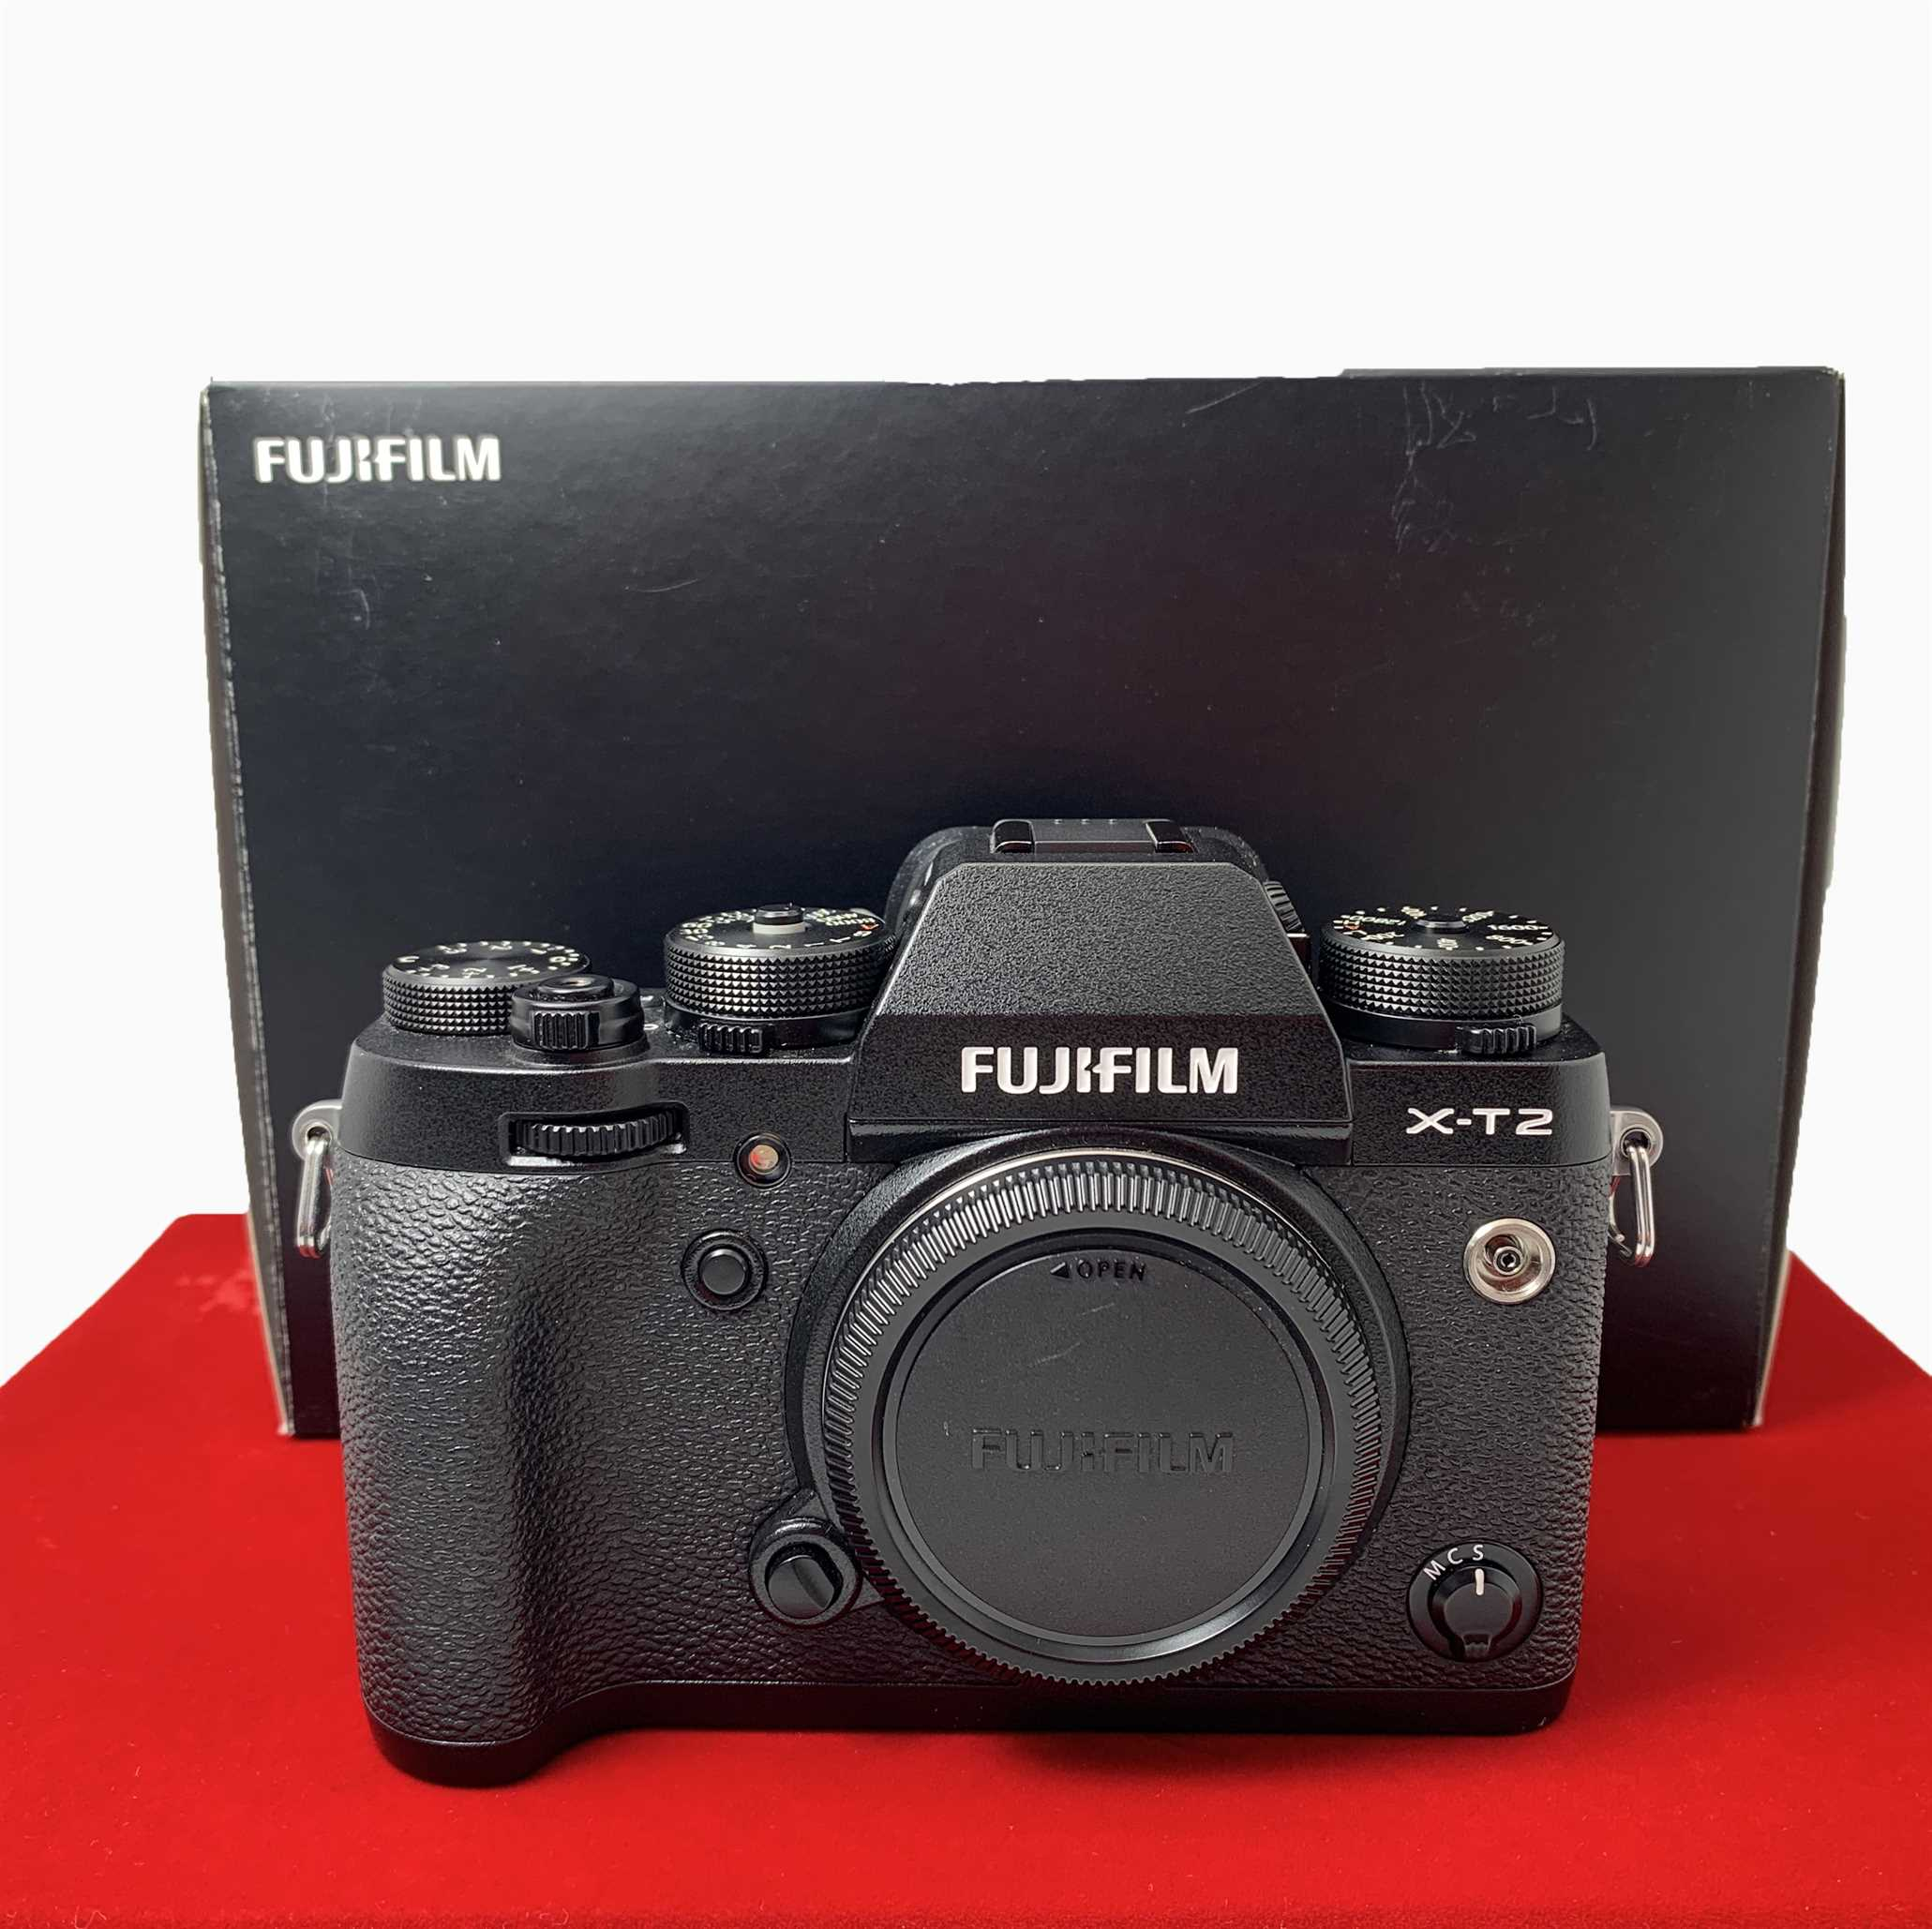 [USED-PJ33] Fujifilm X-T2 Camera Body,95% Like New Condition (S/N:64M57043)